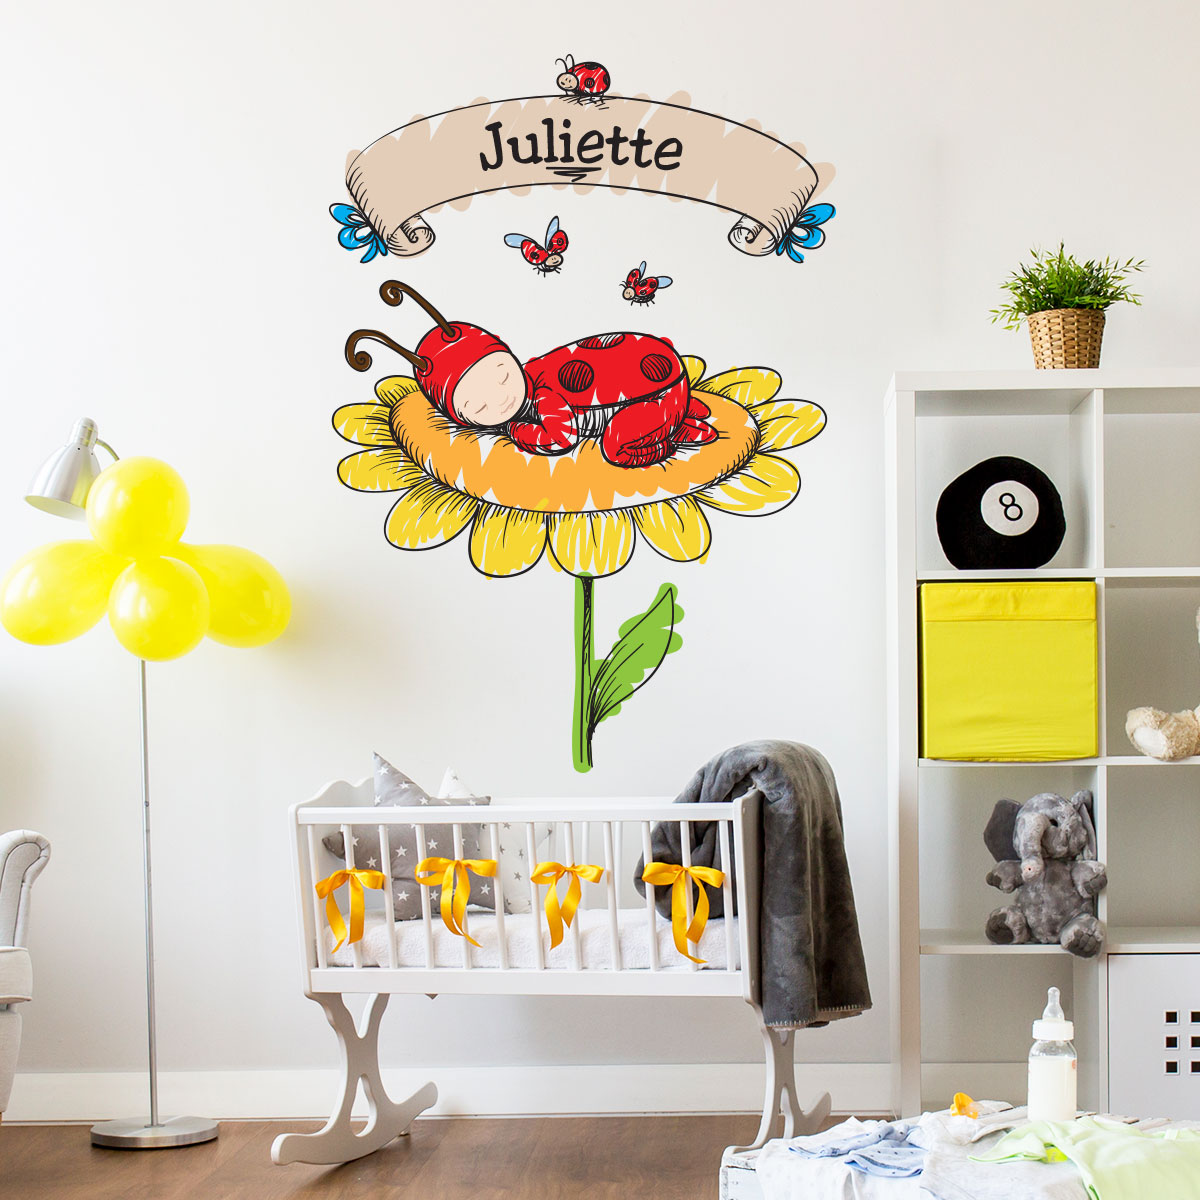 sticker pr nom personnalisable b b coccinelle stickers. Black Bedroom Furniture Sets. Home Design Ideas